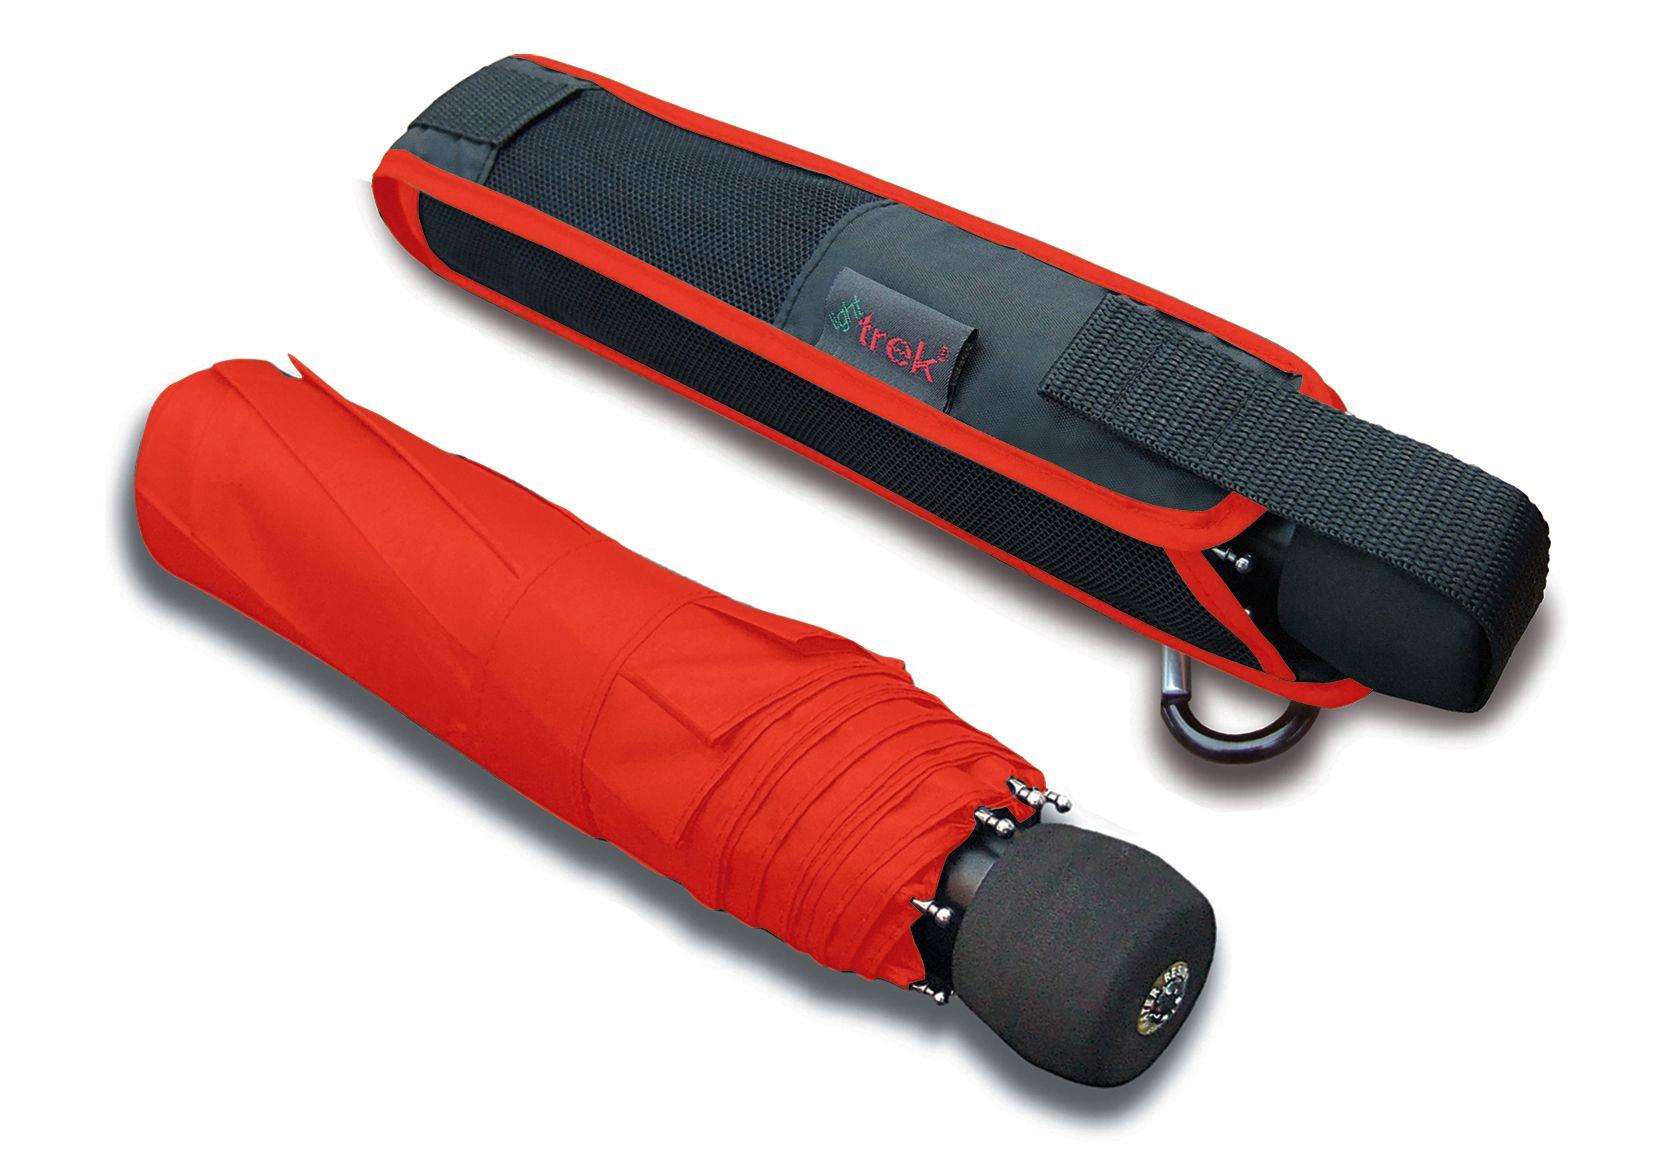 EUROSCHIRM® Euroschirm® Regenschirm - Taschenschirm, »light trek Taschenschirm«